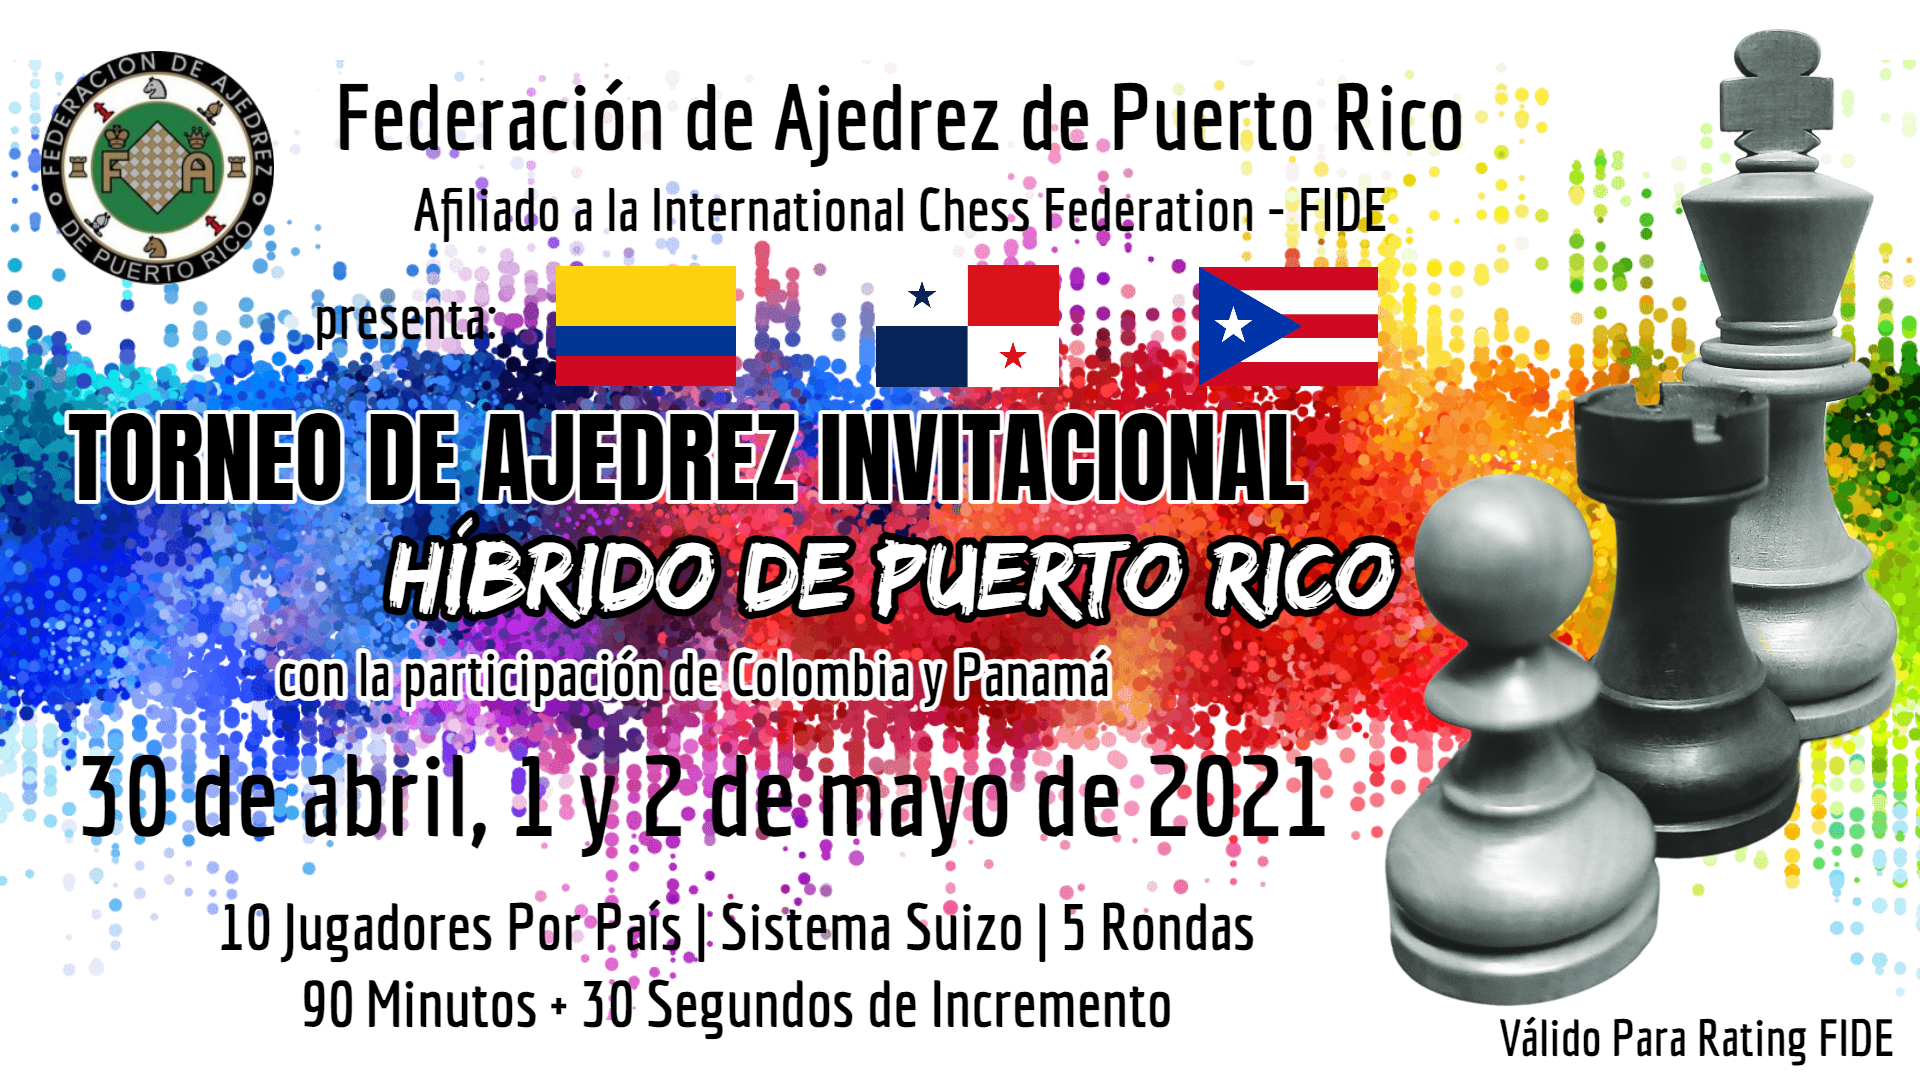 TORNEO DE AJEDREZ INVITACIONAL HIBRIDO D